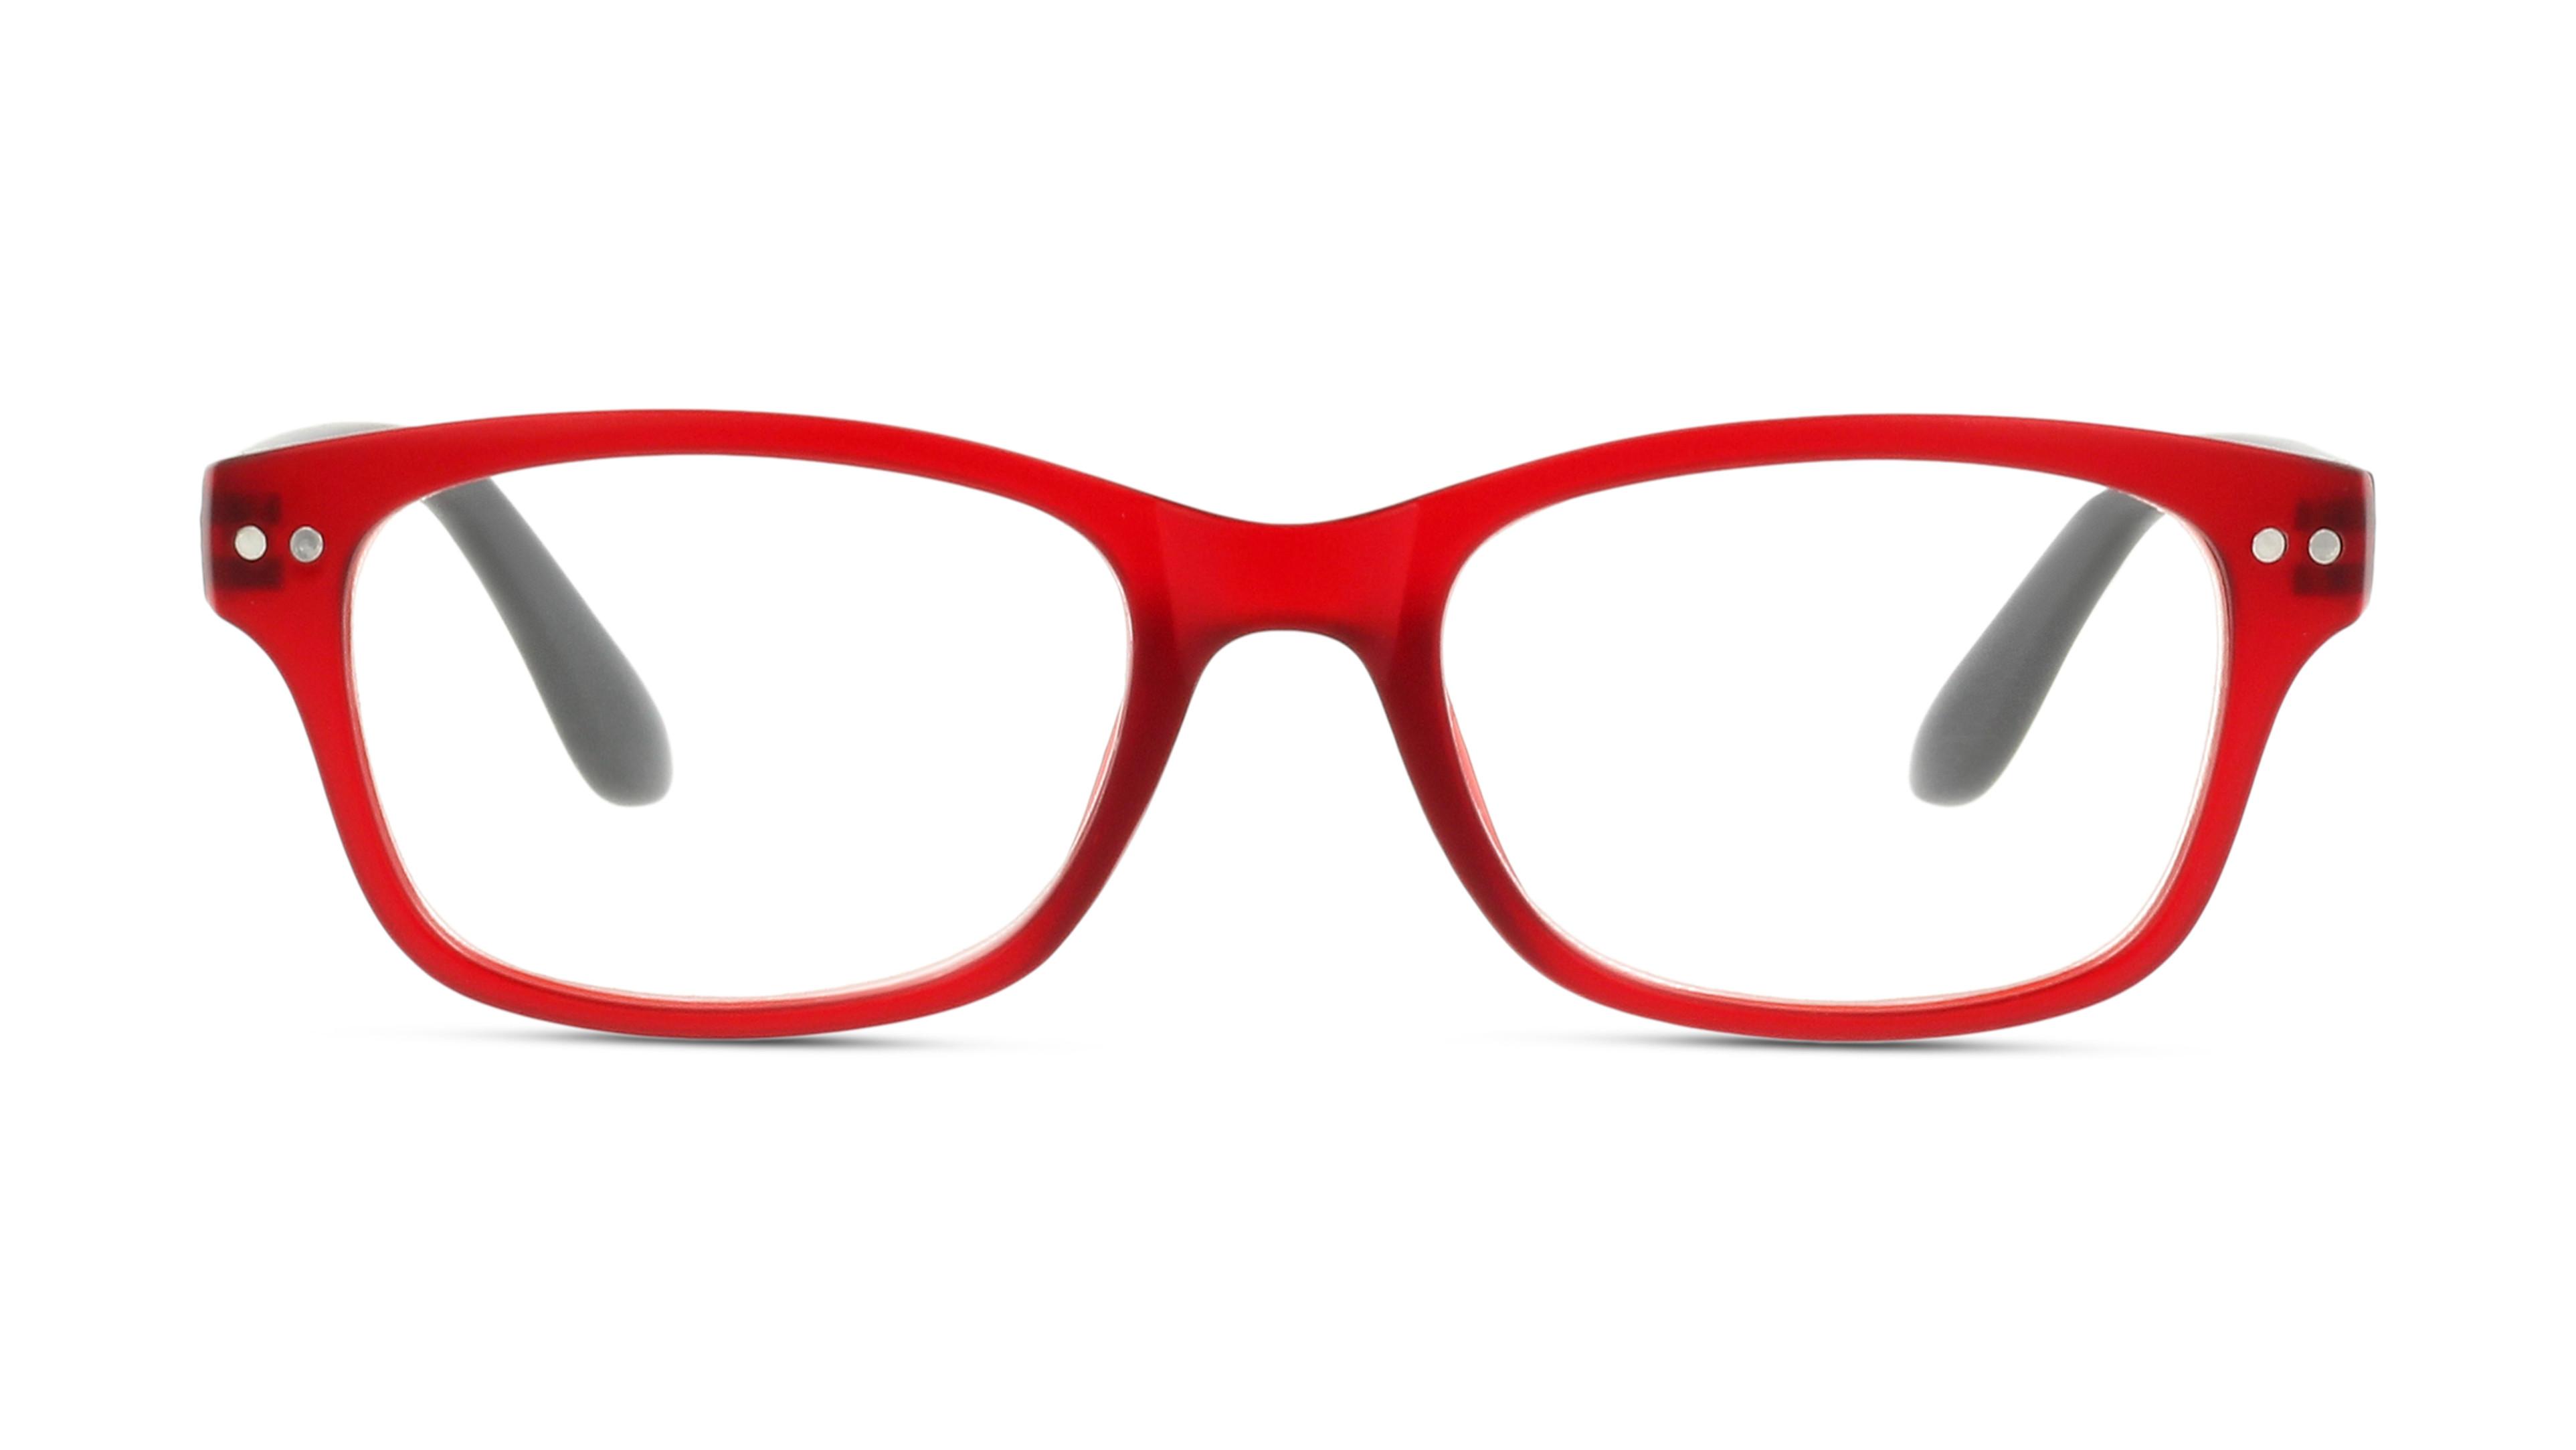 8719154524646-front-01-gv-library-hfcu08-Eyewear-red-black